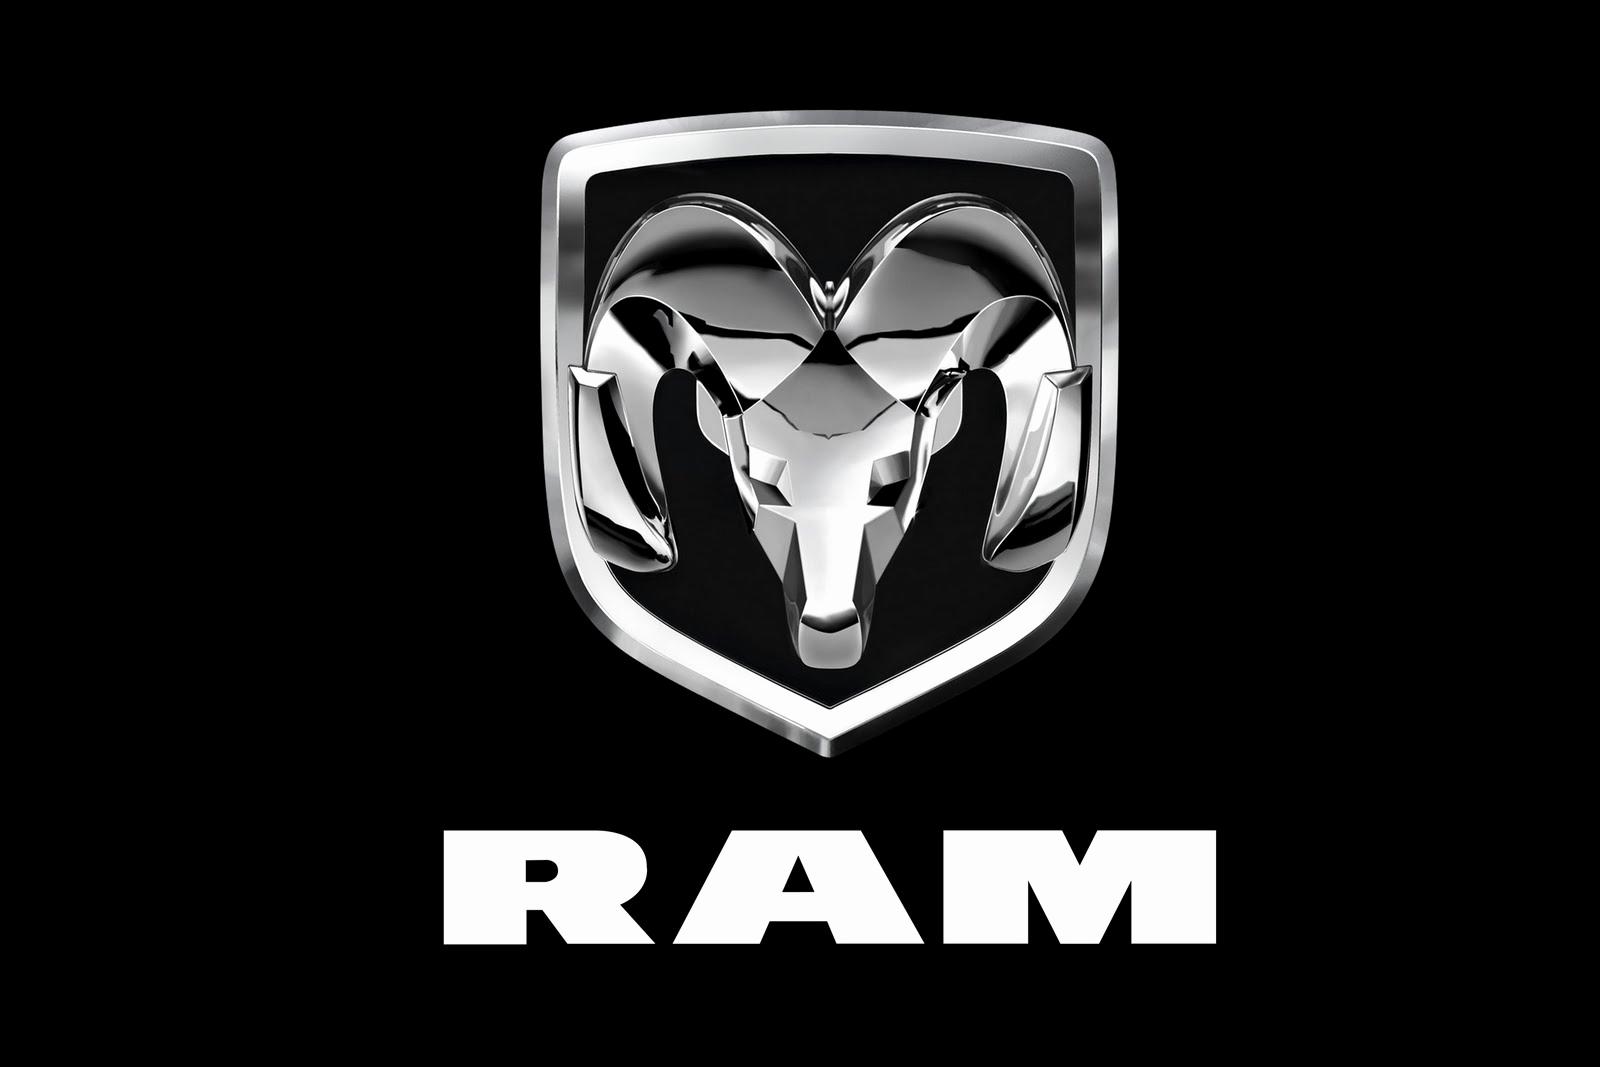 dodge ram logo vector Unique Ram truck Logos